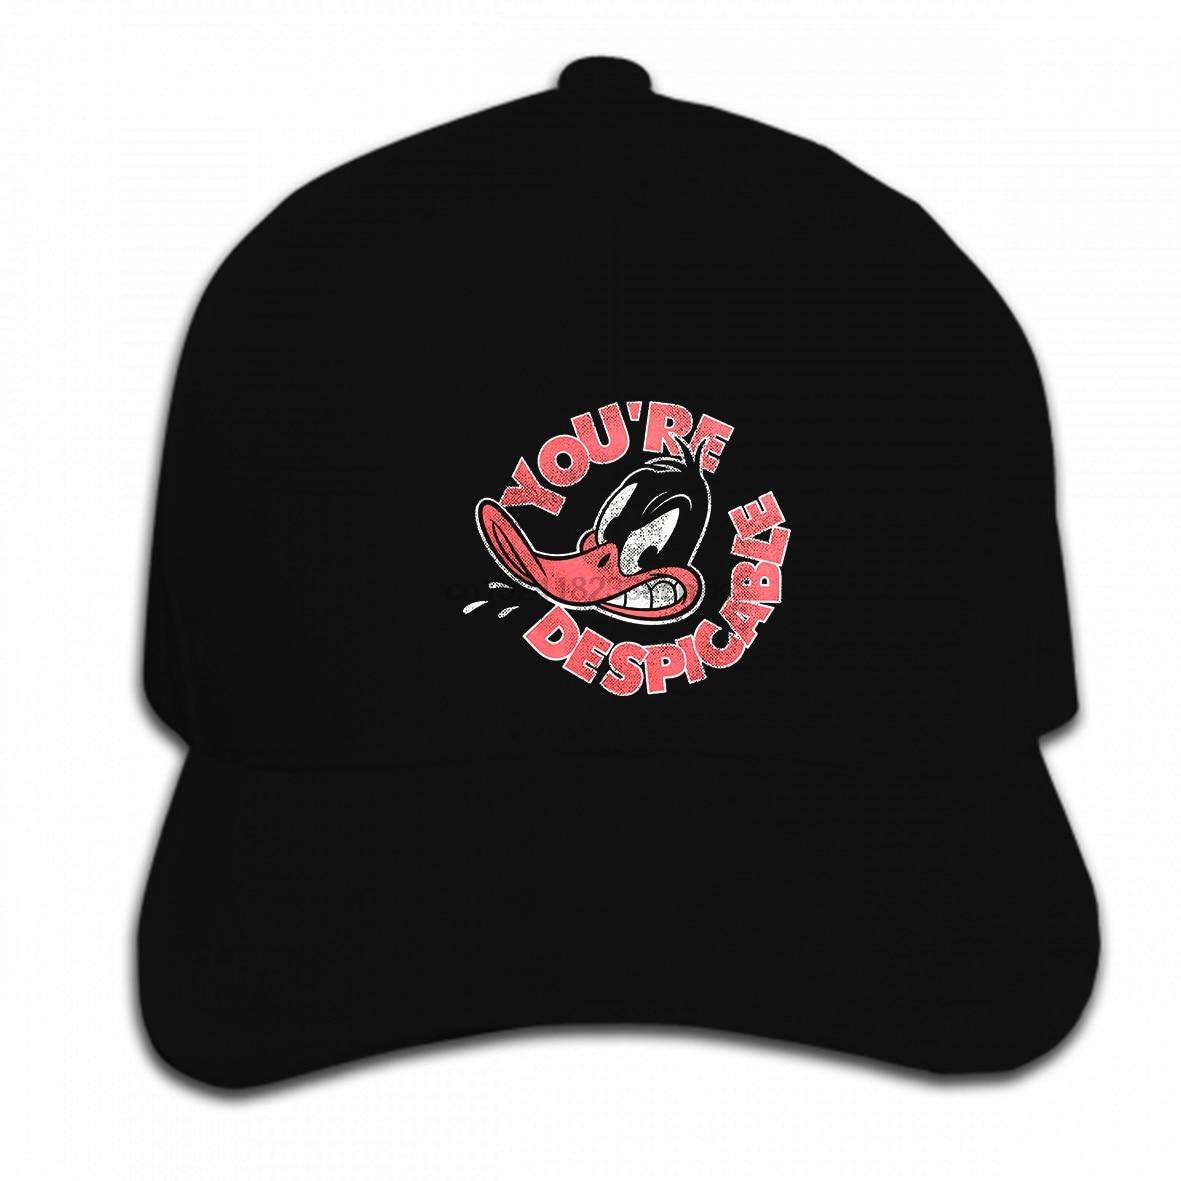 49a2c191b US $9.9 |Print Custom Baseball Cap Hip Hop Daffy Duck Despicable Looney  Tunes Bugs Bunny Toons Black Mens Hat Peaked cap-in Baseball Caps from  Apparel ...